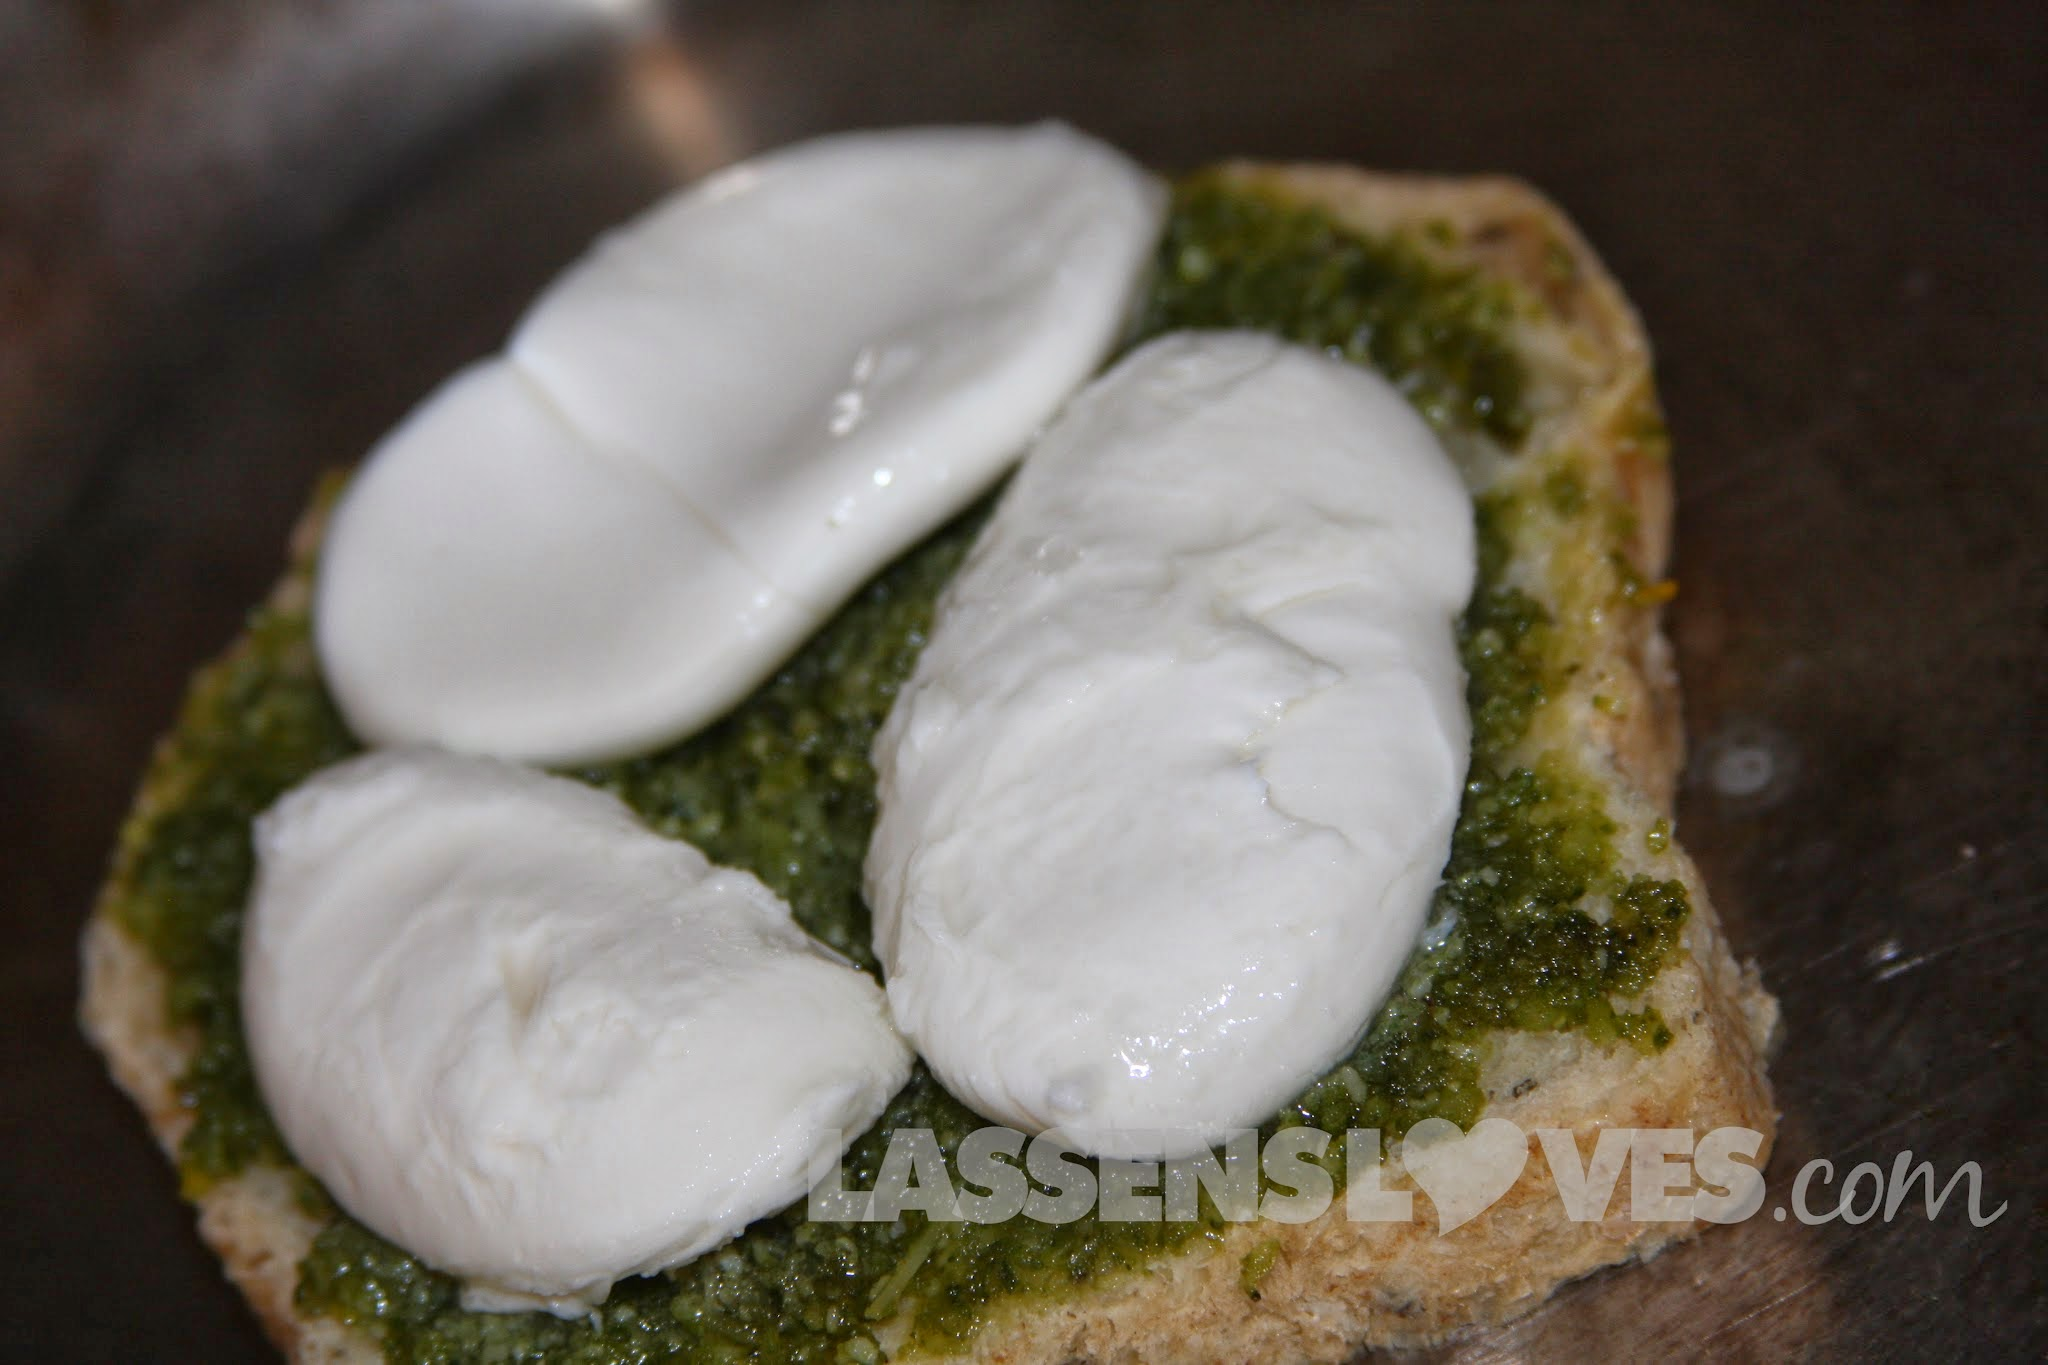 pesto+caprese+sandwich, caprese+sandwich, caprese+panini, pesto+panini